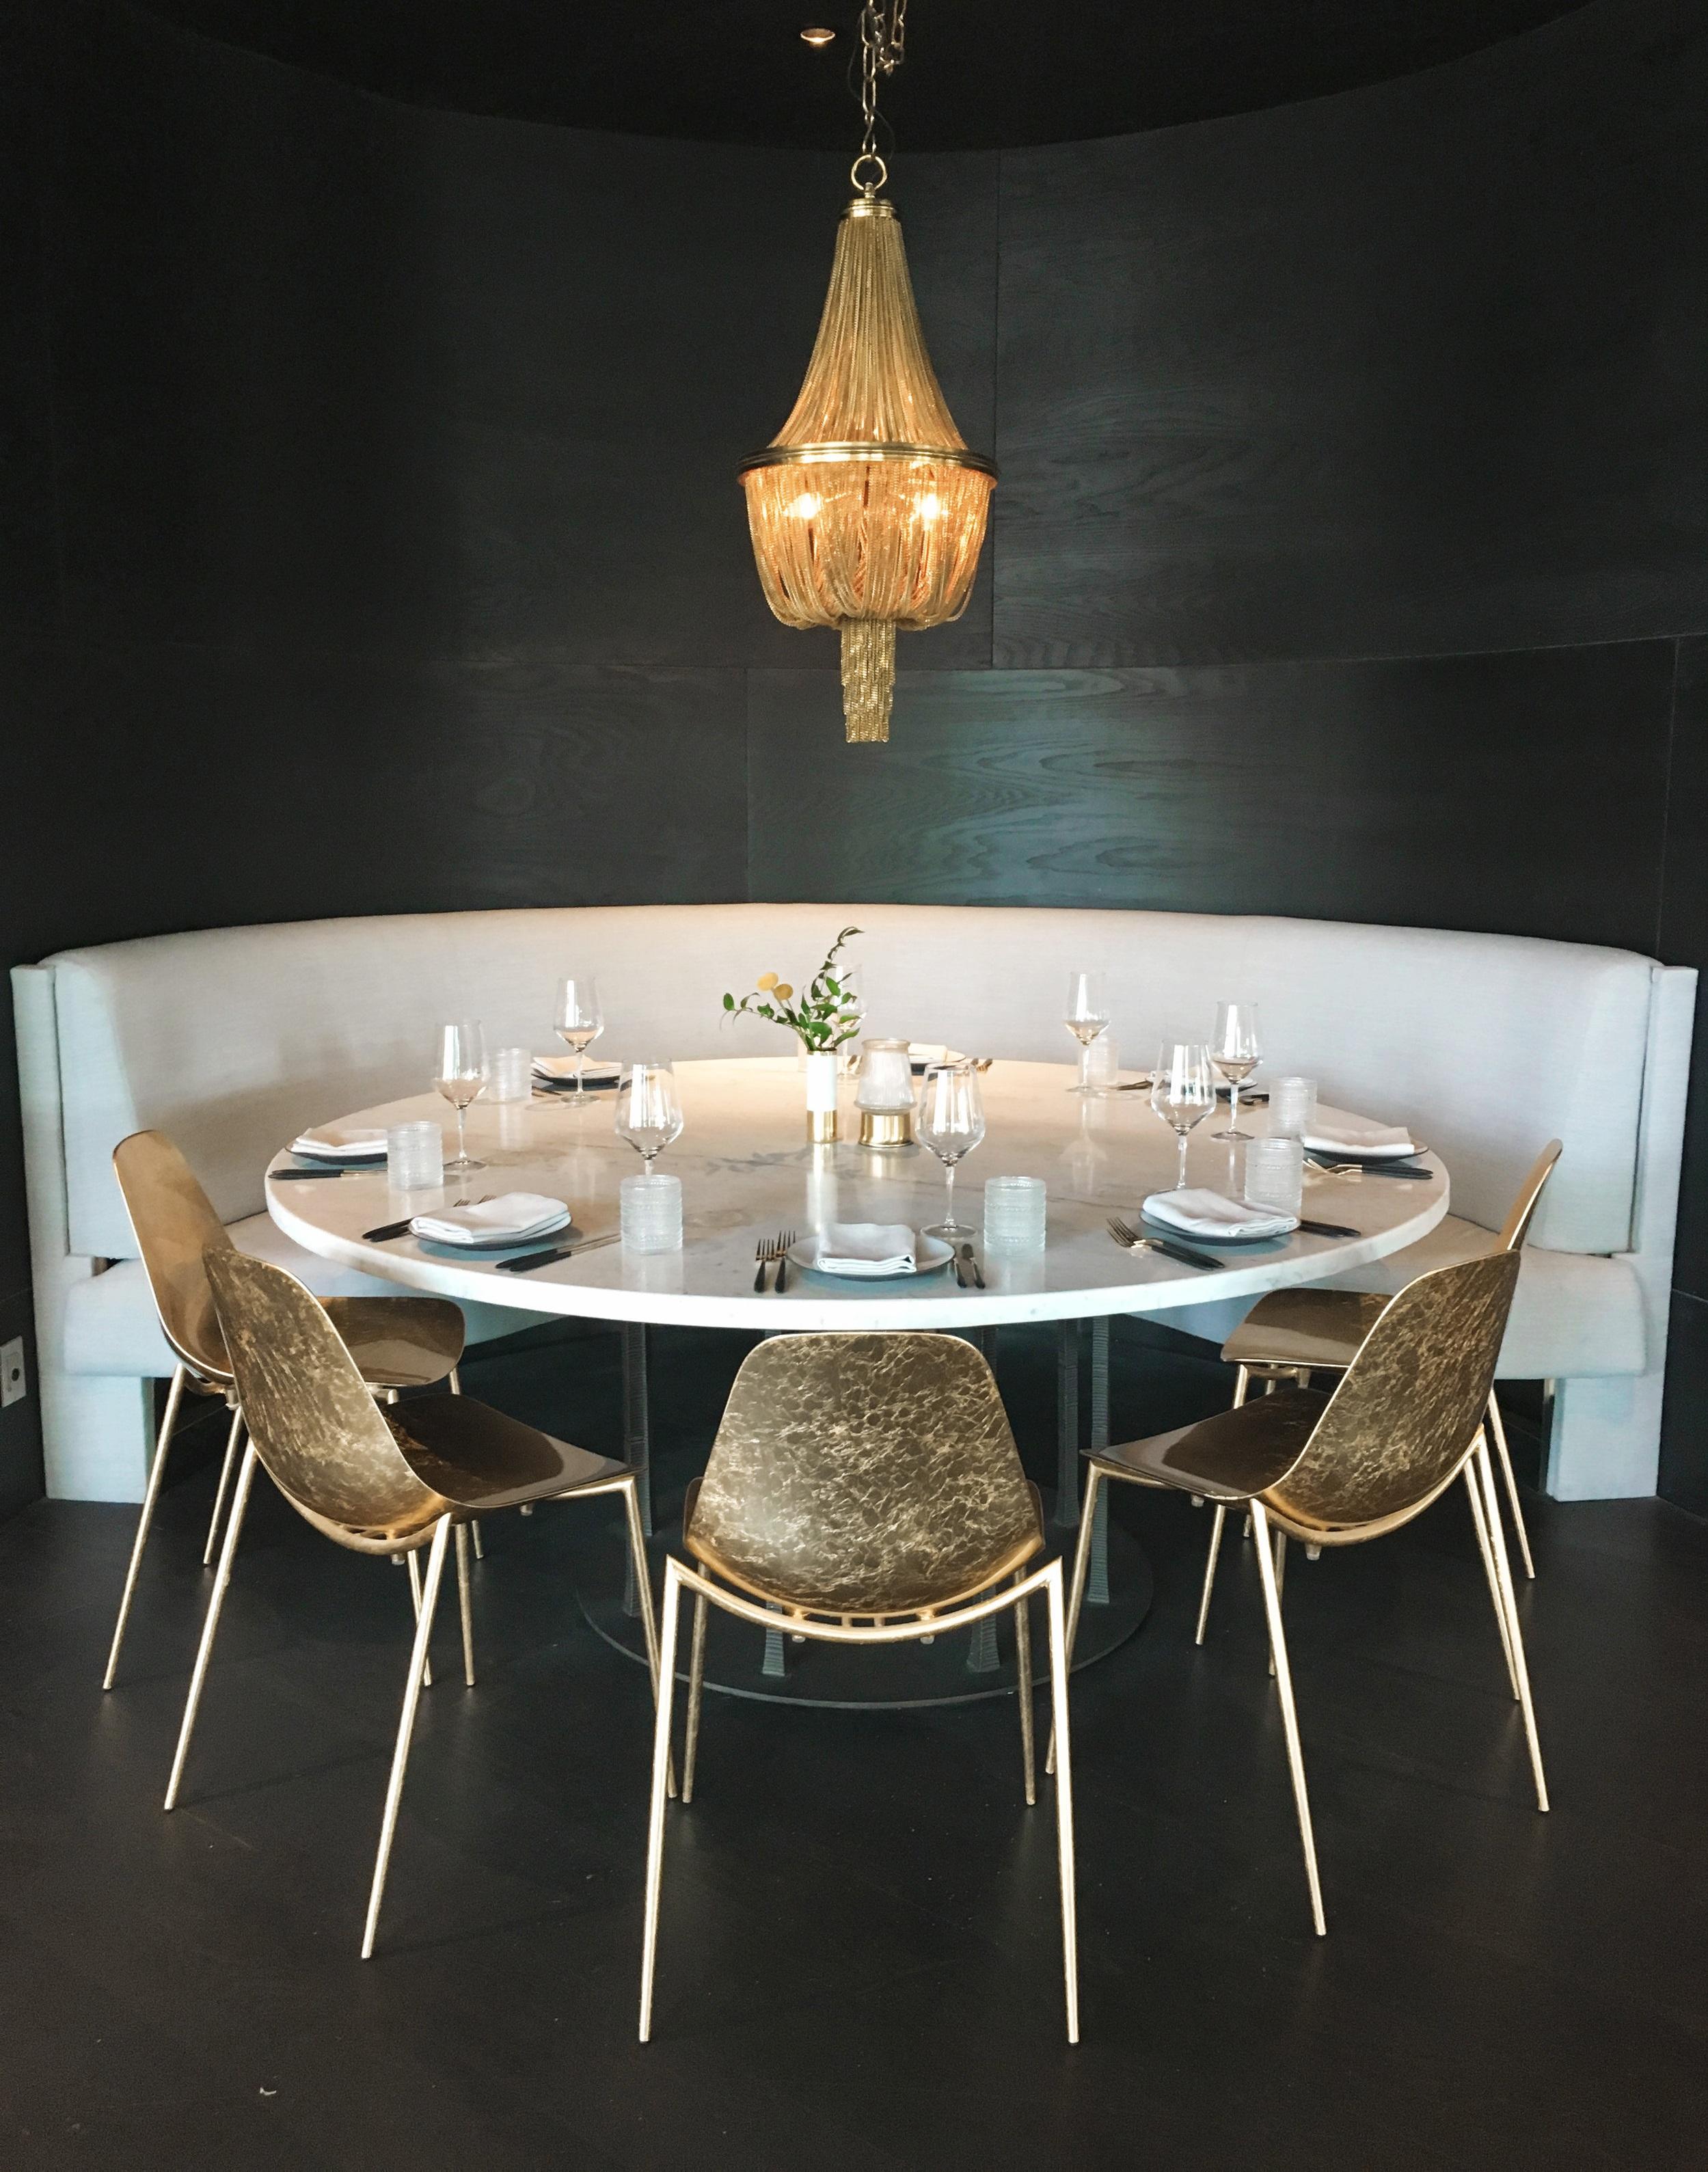 Top Chef's season 10 winner Kristen Kish's restaurant Arlo Grey.